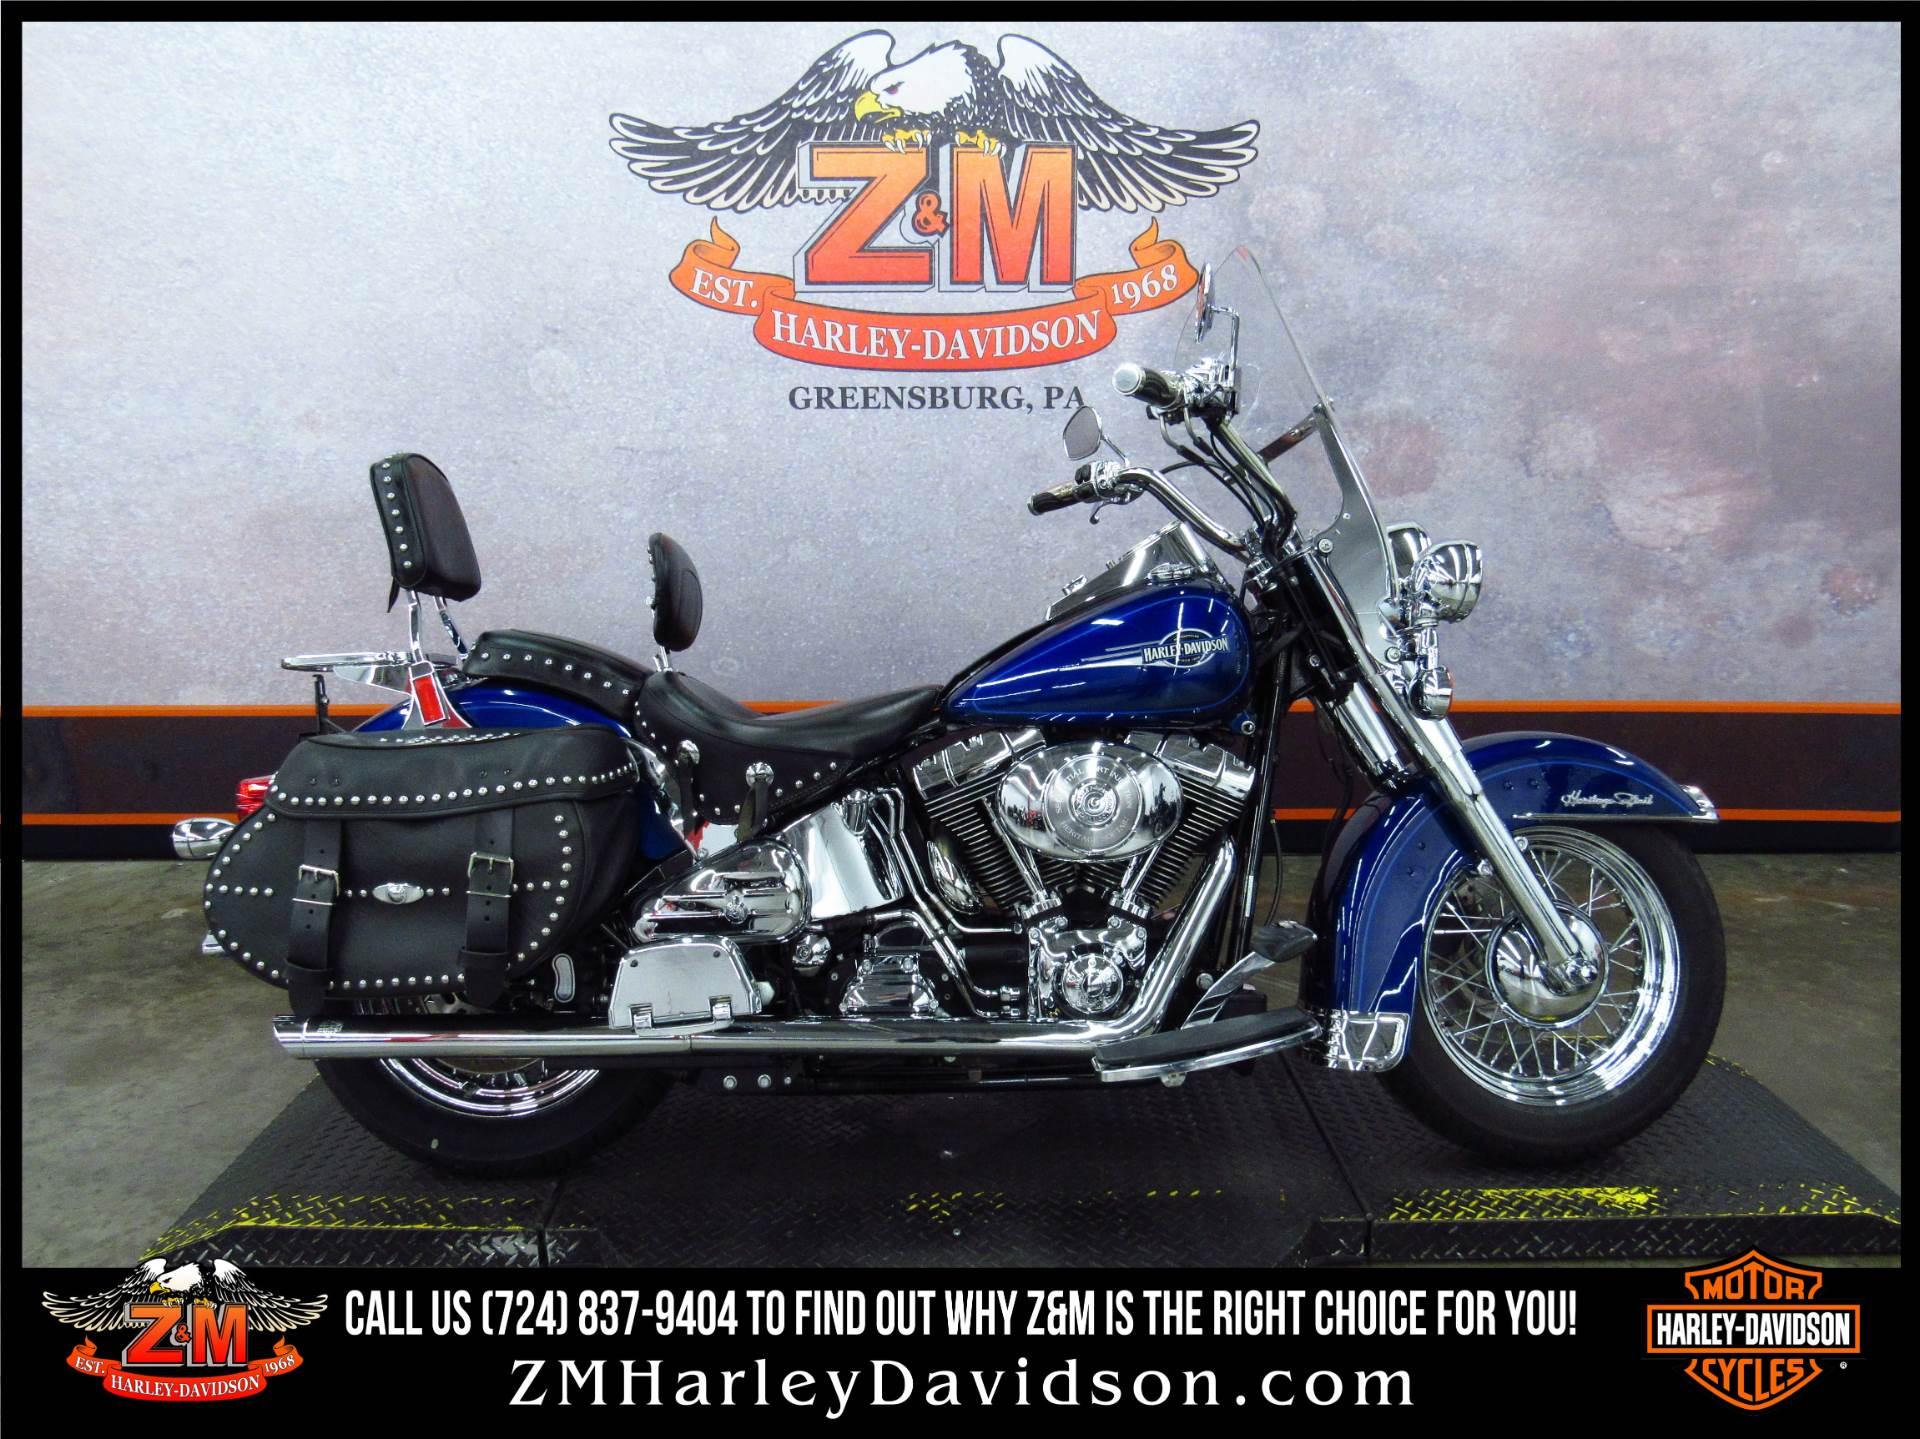 2006 Harley Davidson Heritage Softail Classic Motorcycles In Greensburg Pennsylvania